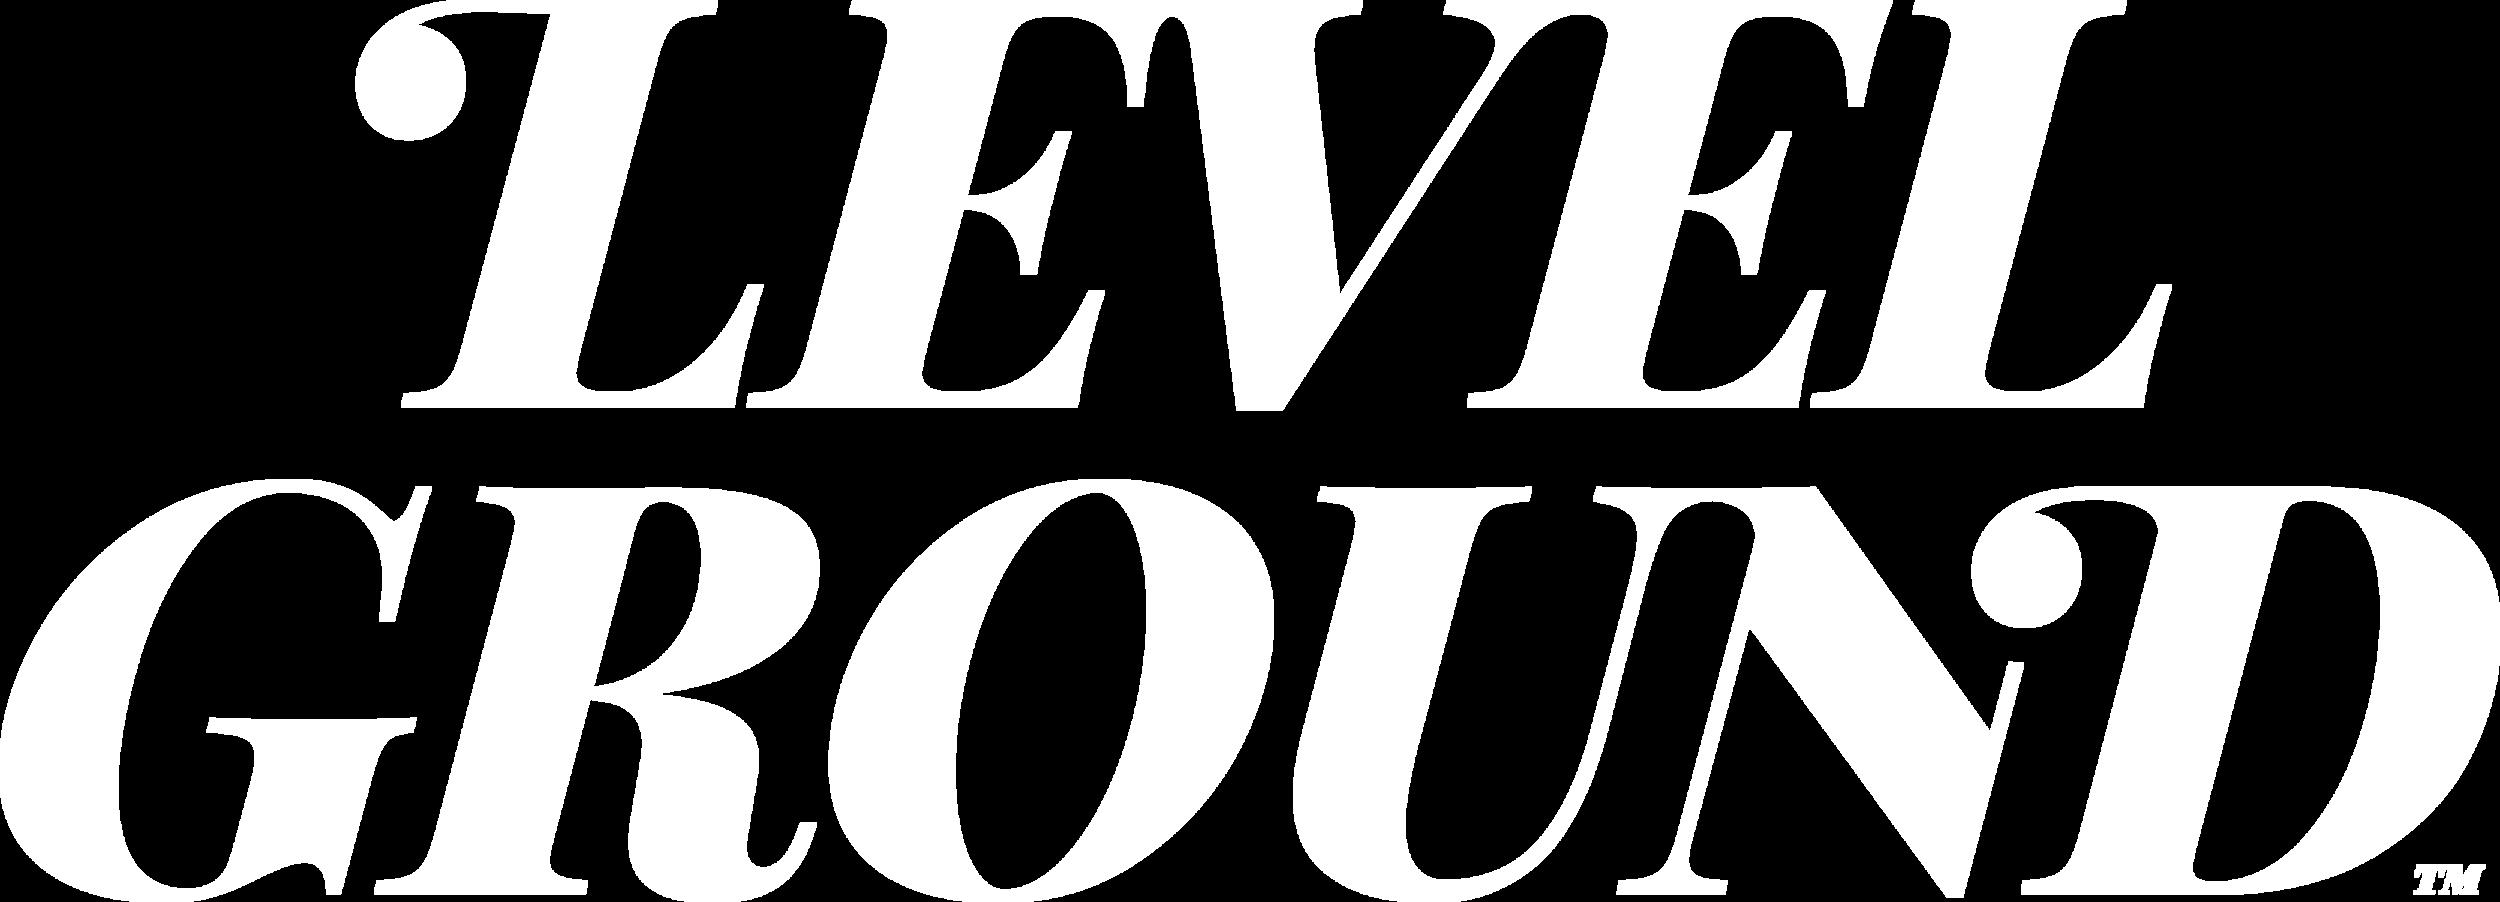 LevelGround-logotype-rev.png